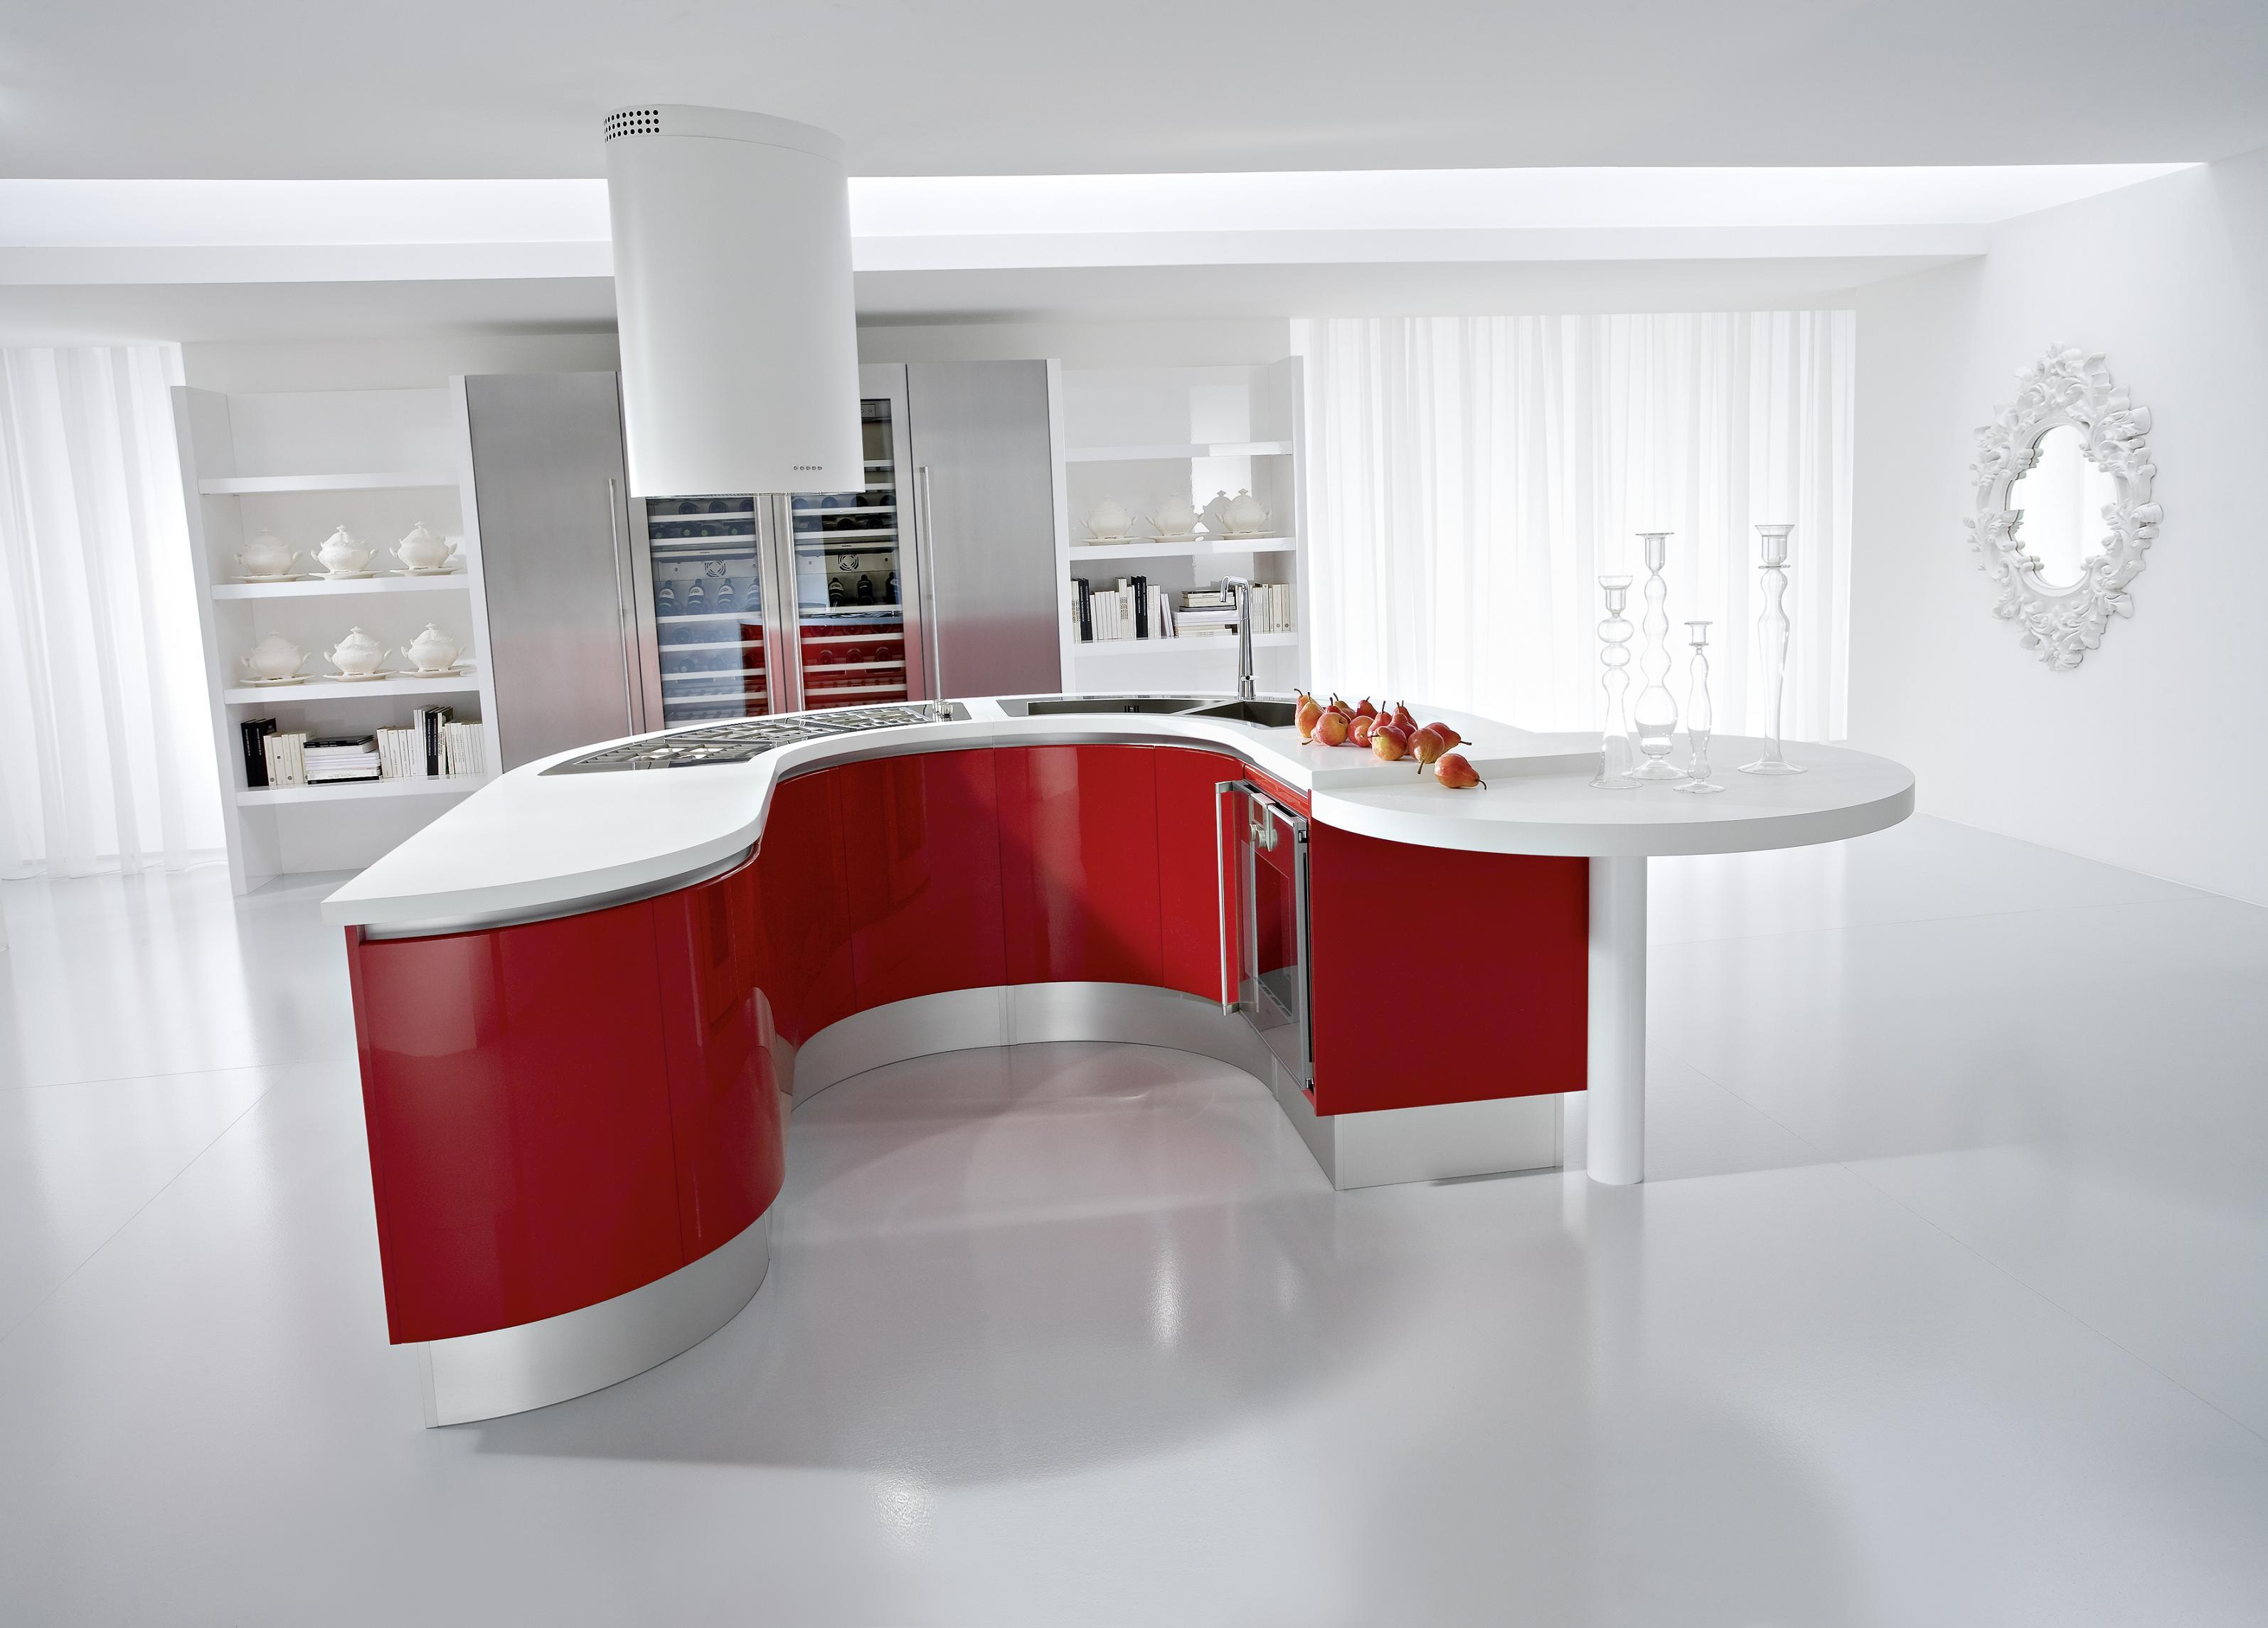 Wood kitchen pantry Photo - 10